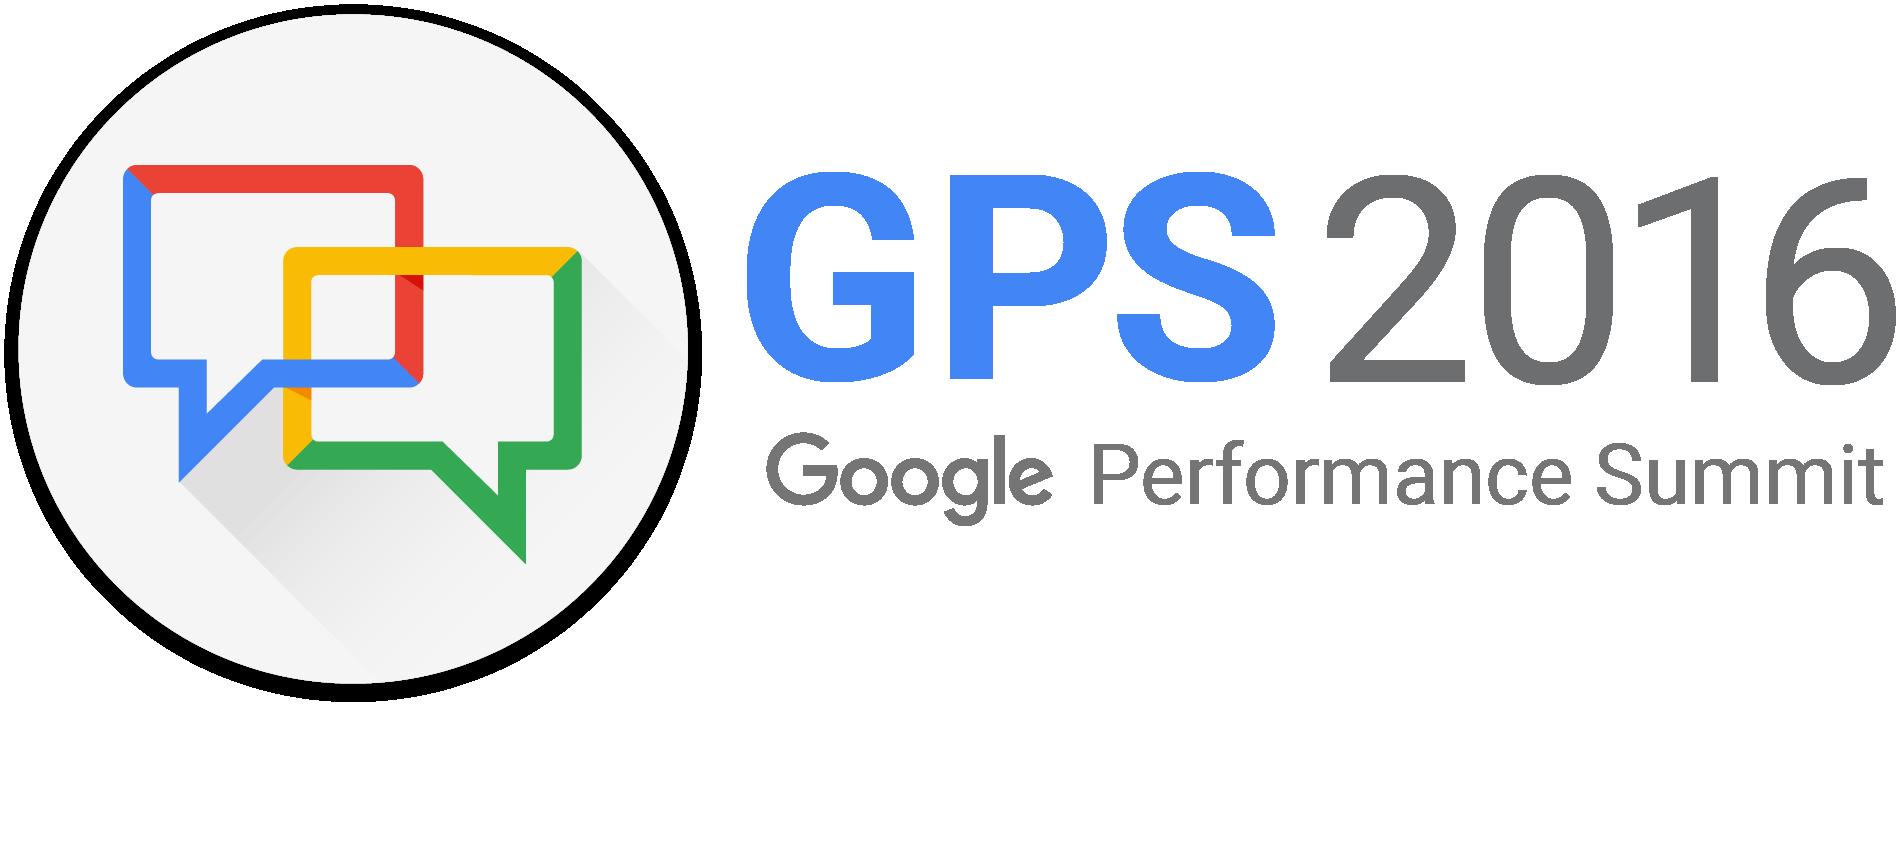 Google-Performance-Summit-2016